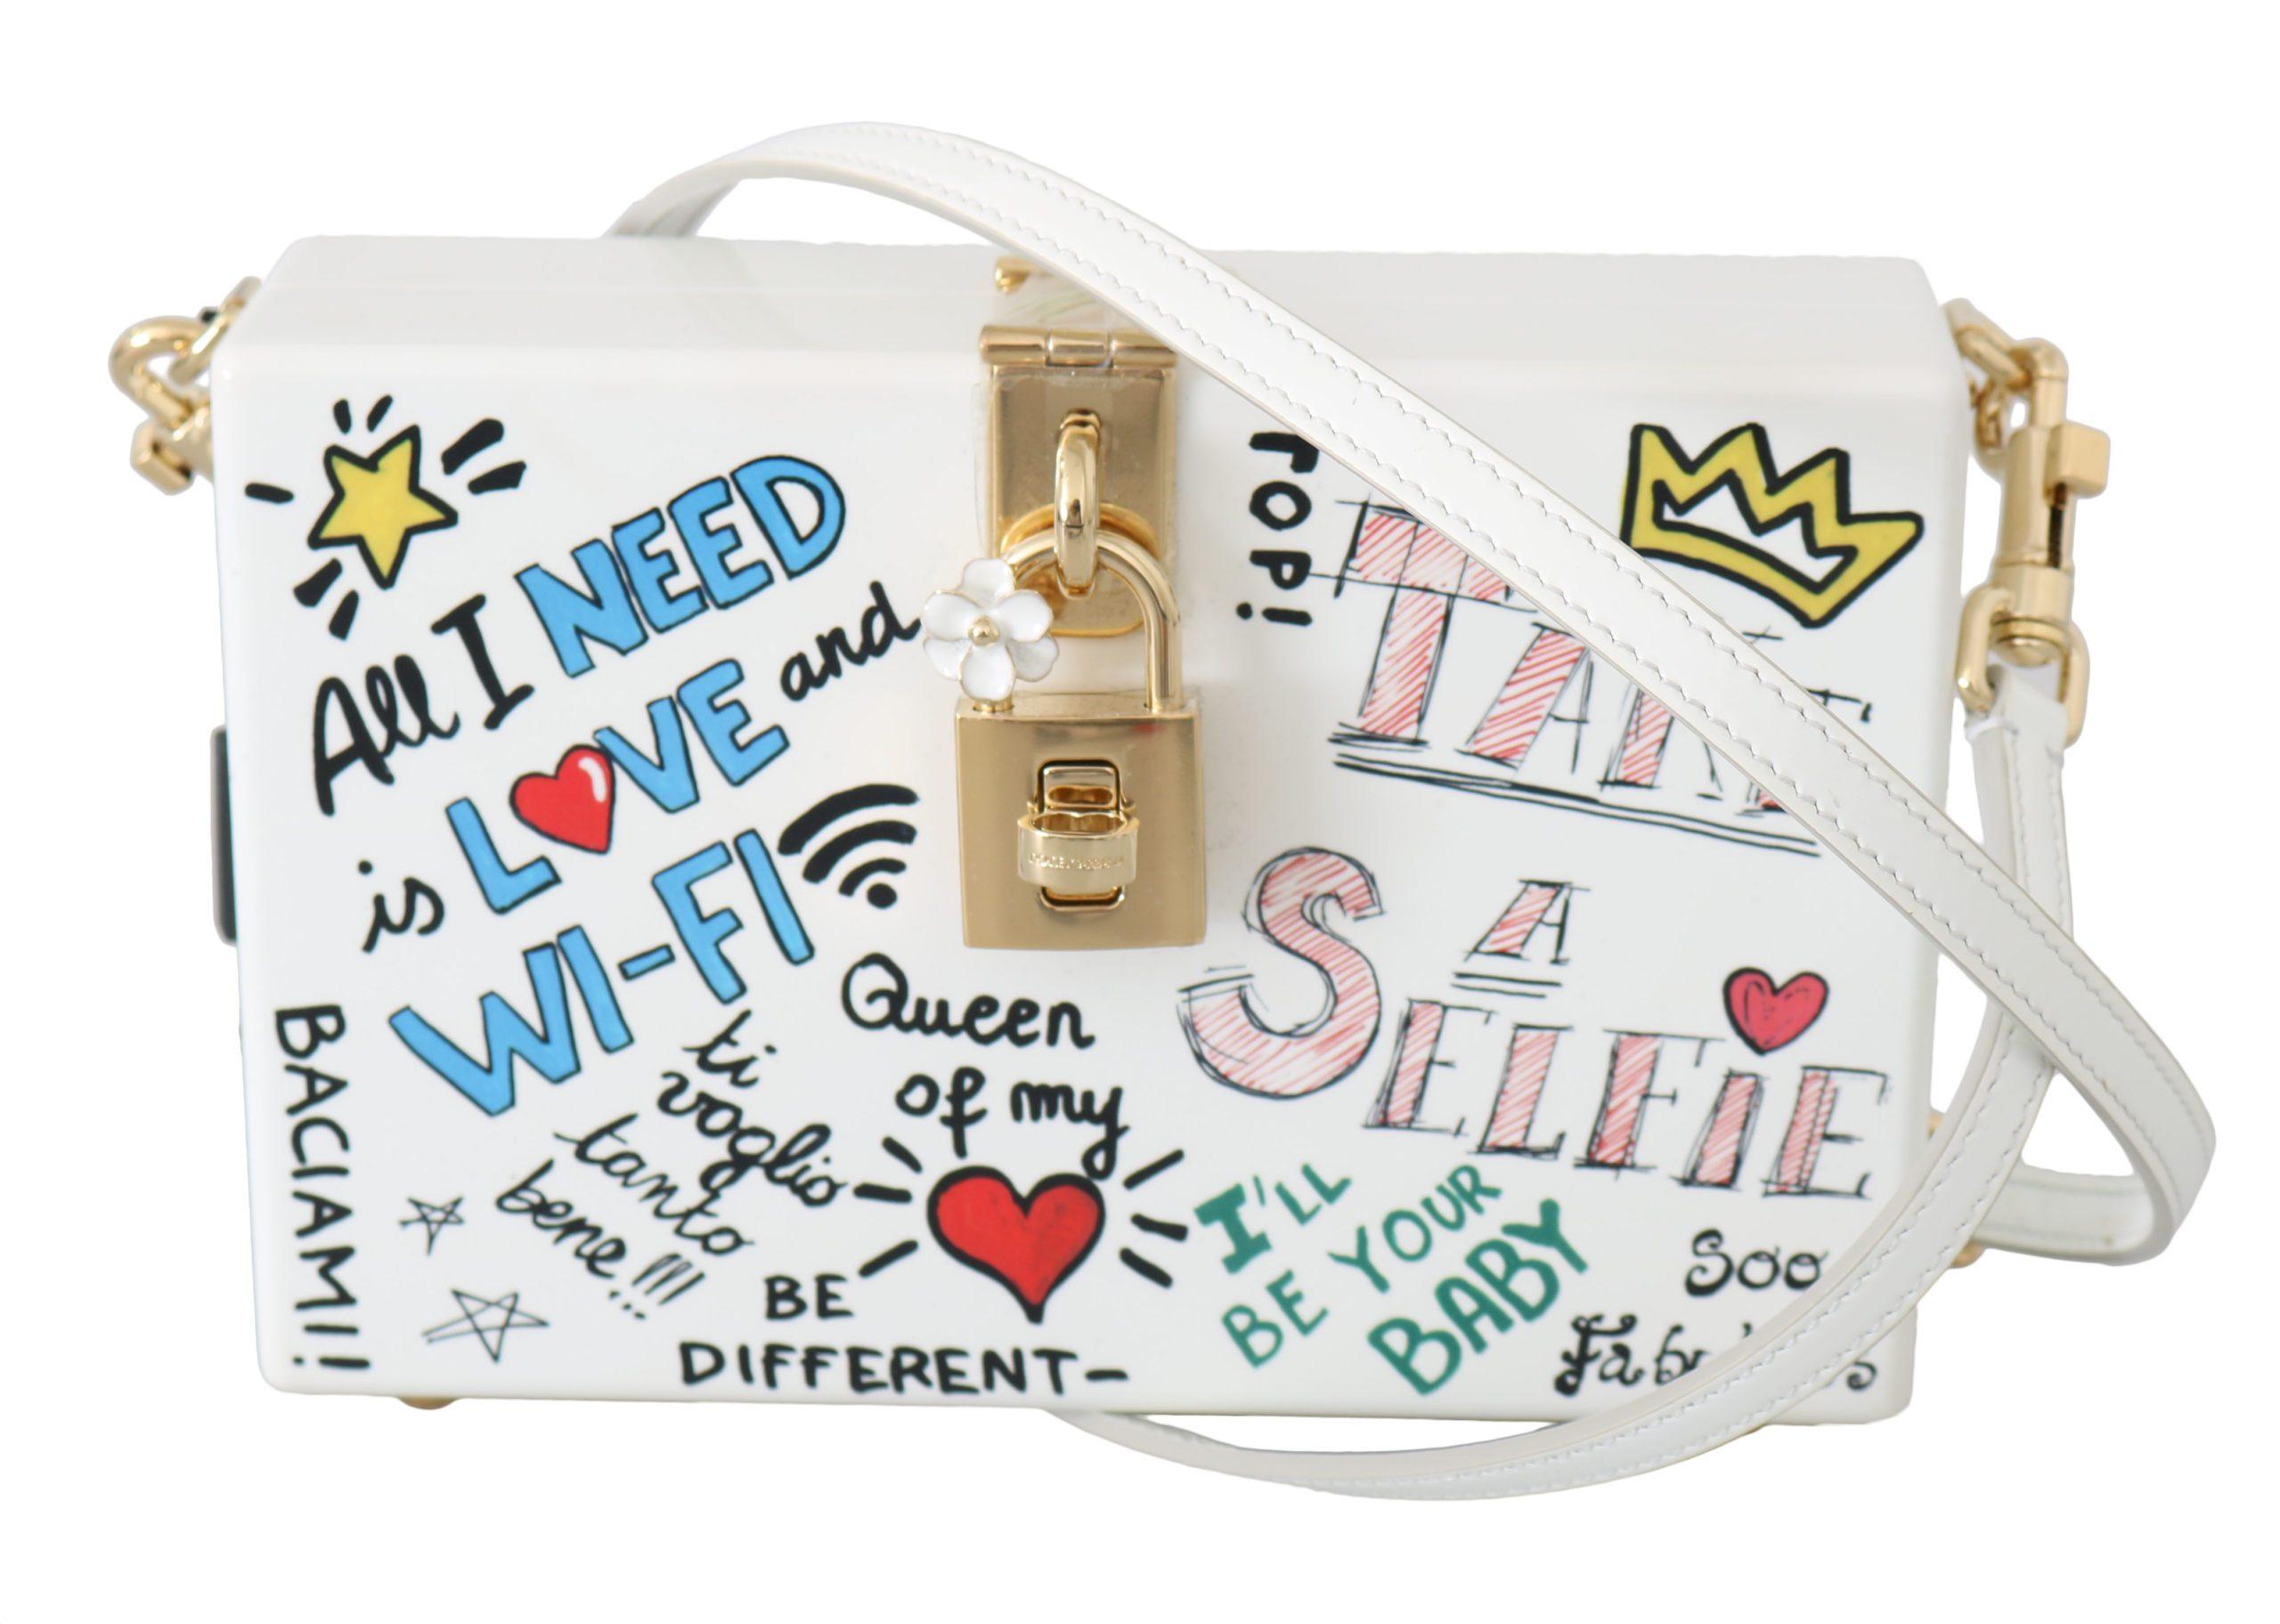 Dolce & Gabbana Women's Hand Painted Wooden Leather Shoulder Bag White VAS8696